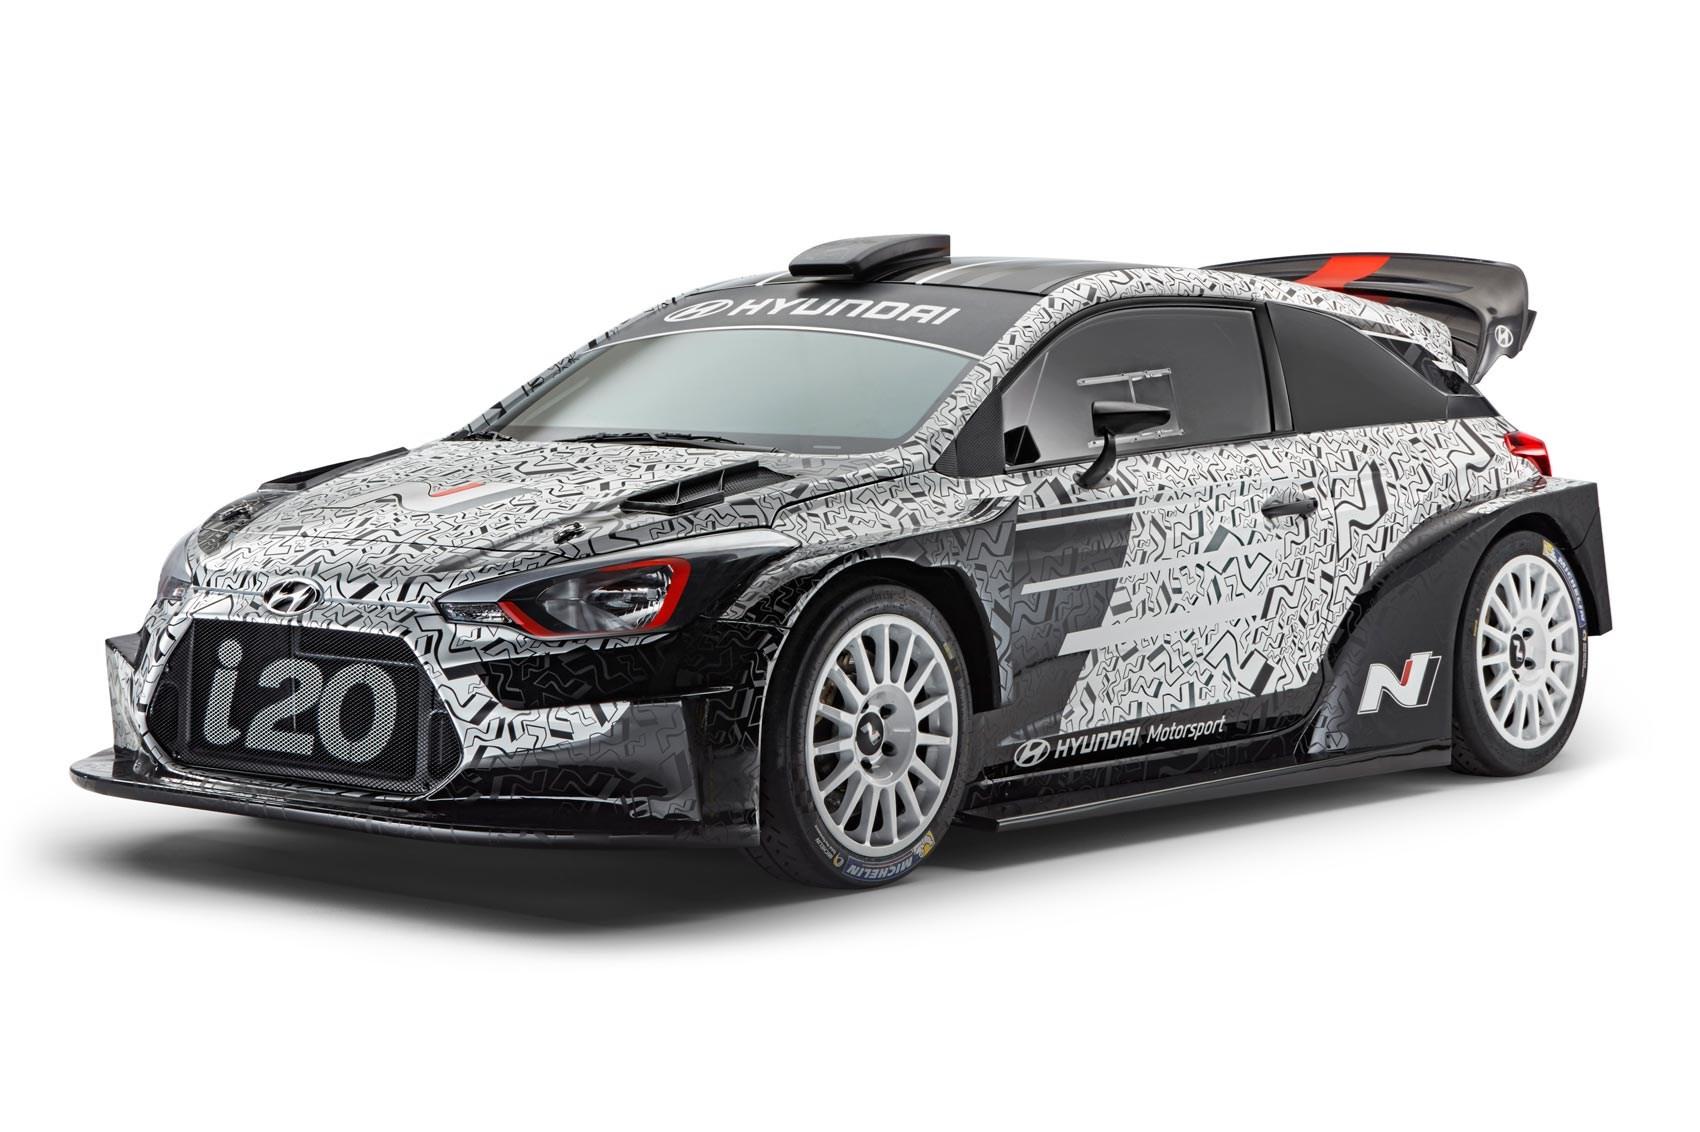 Paris Motor Show: Hyundai RN30 280kW concept previews i30N hot hatch